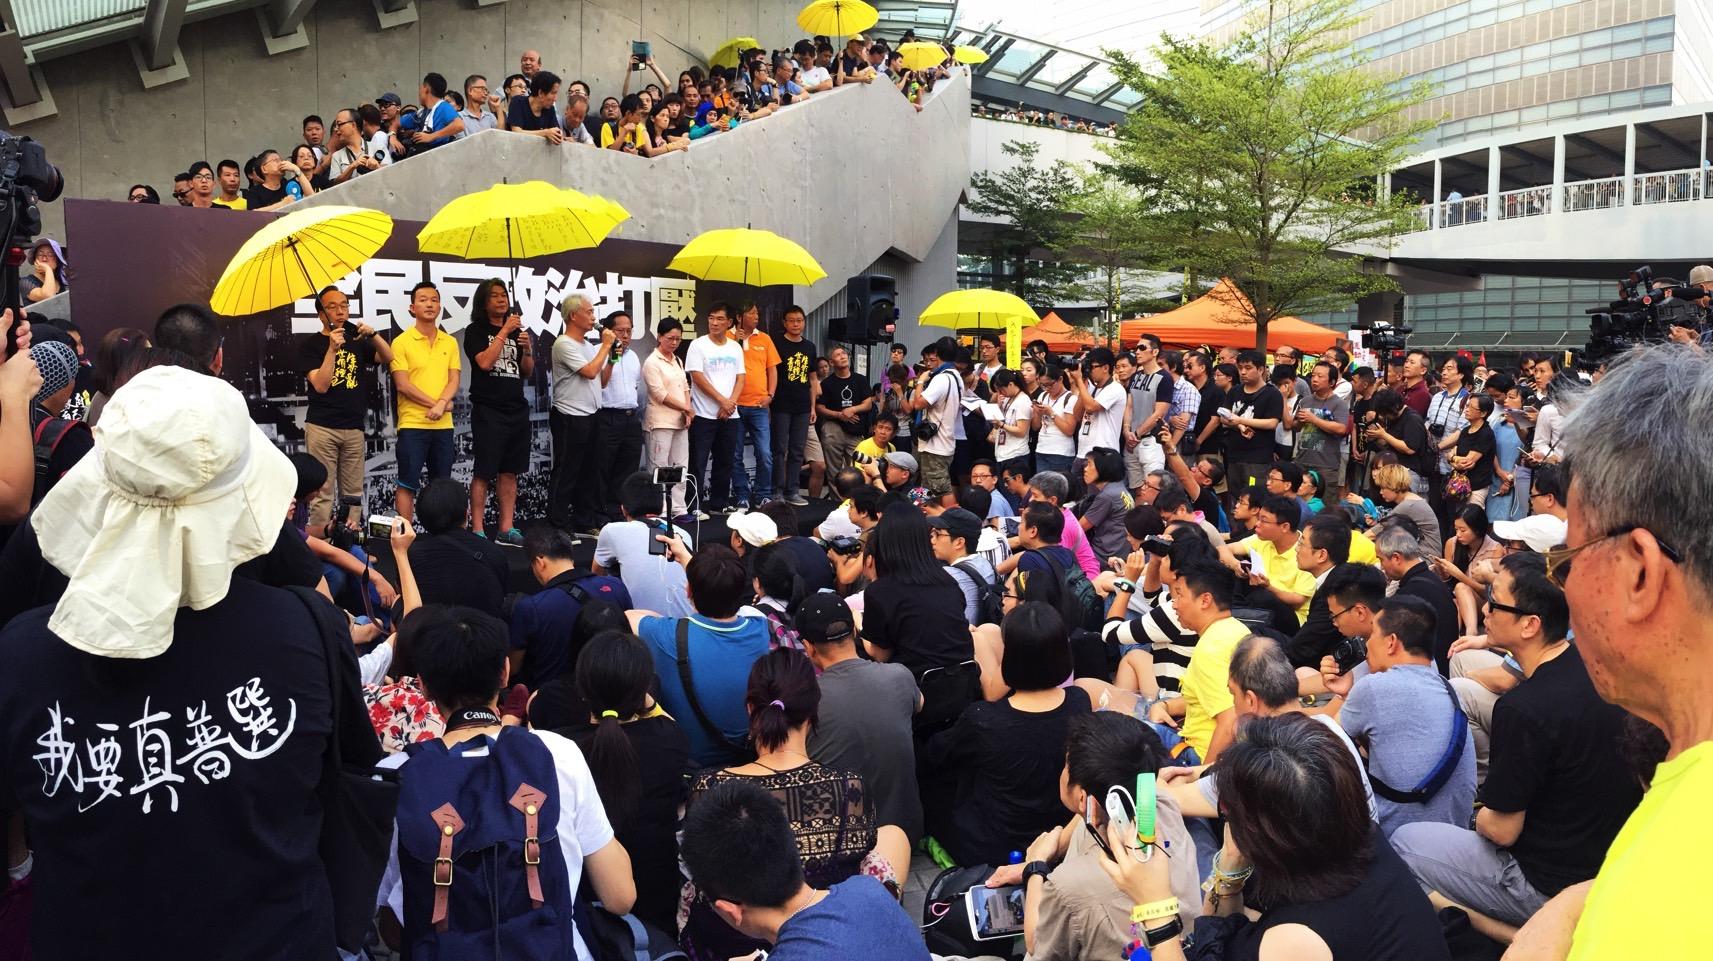 hong kong umbrella movement one year anniversary stage